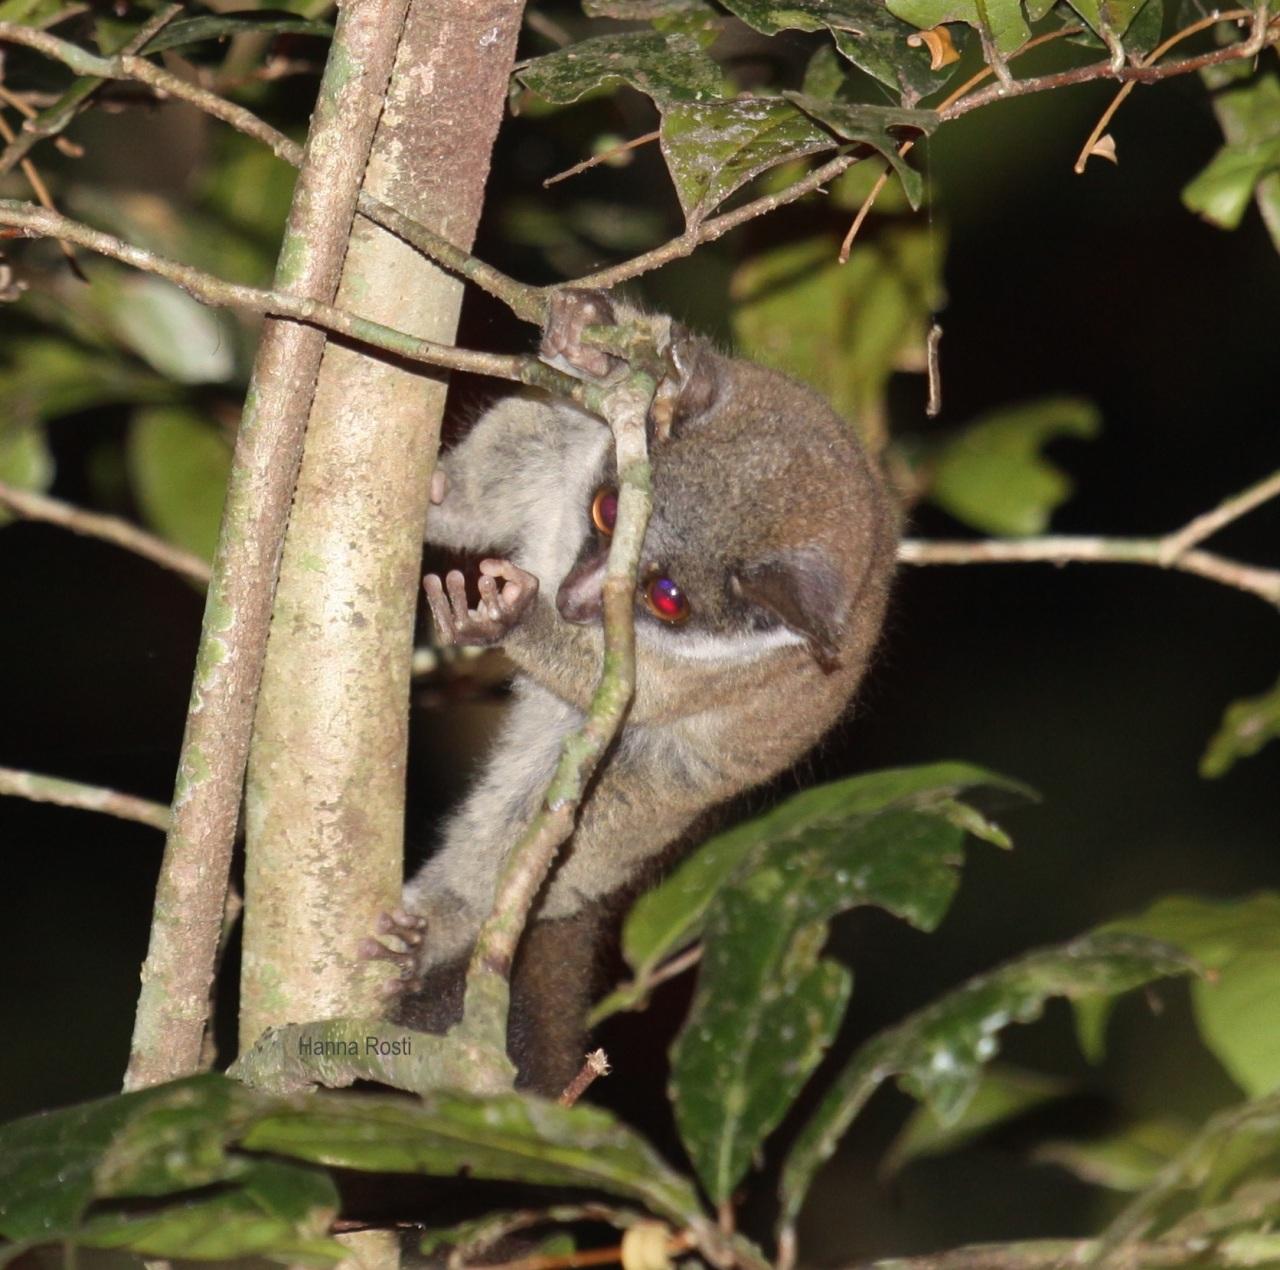 Suku Paragalago, Itä-Afrikanpikkugalagot